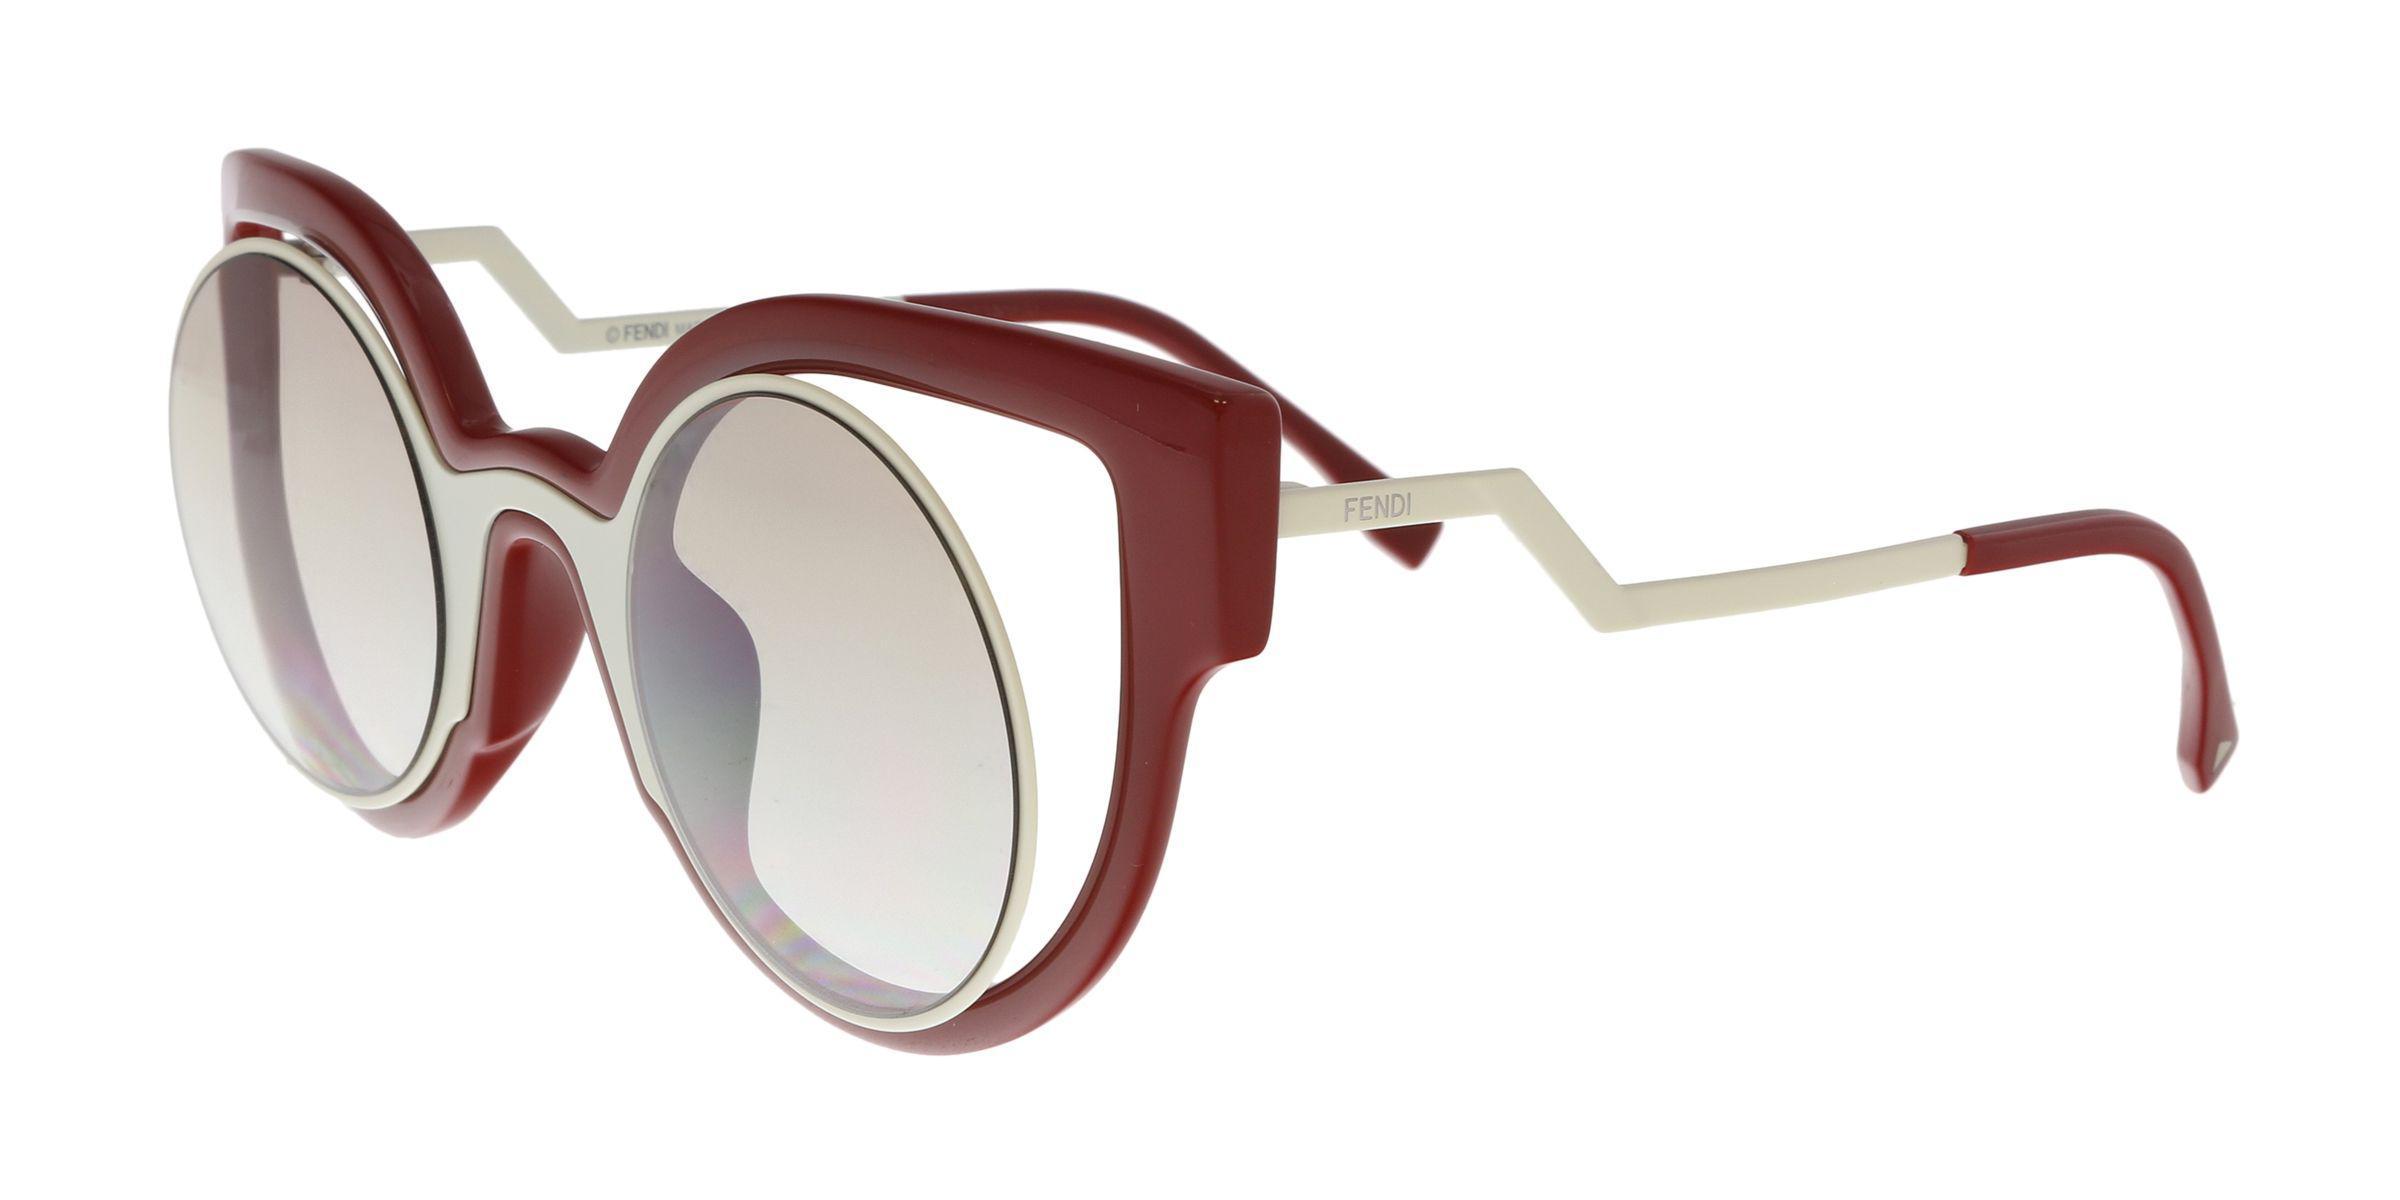 4426aa247168 Fendi - Multicolor Ff 0137 s 0nt4 Cream red Cat Eye Sunglasses - Lyst. View  fullscreen